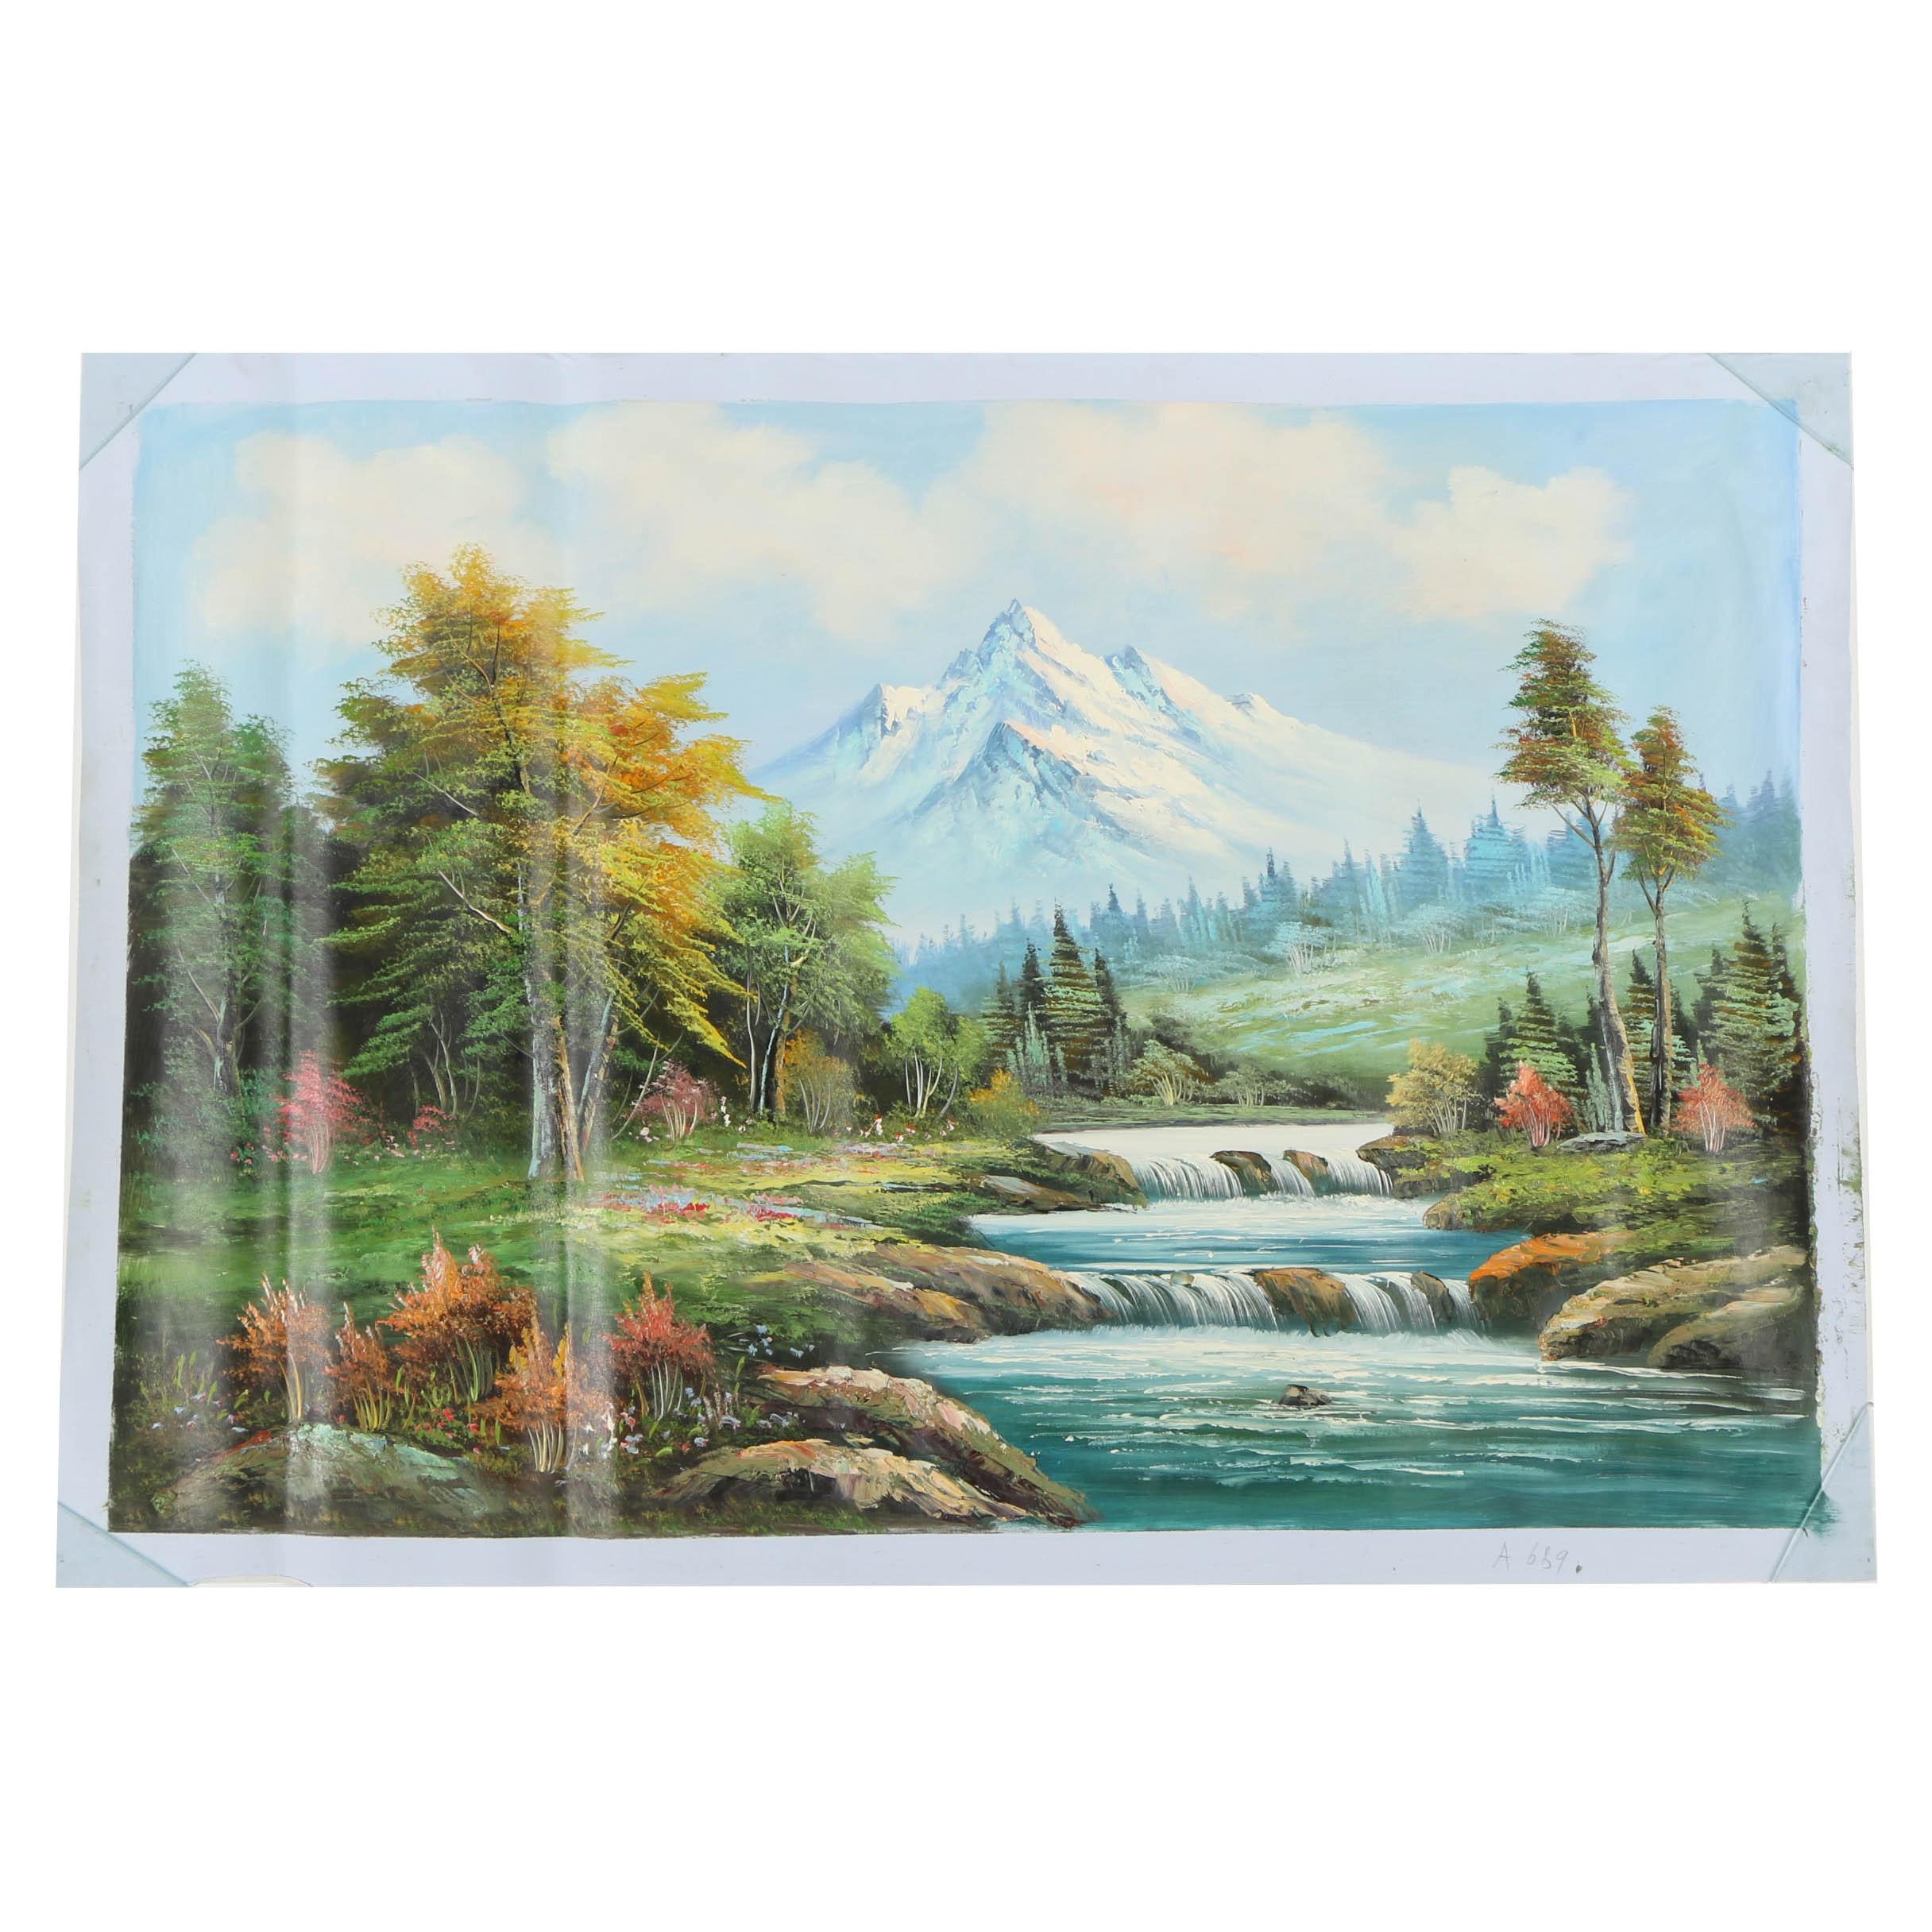 Oil Painting of a Mountainous Landscape